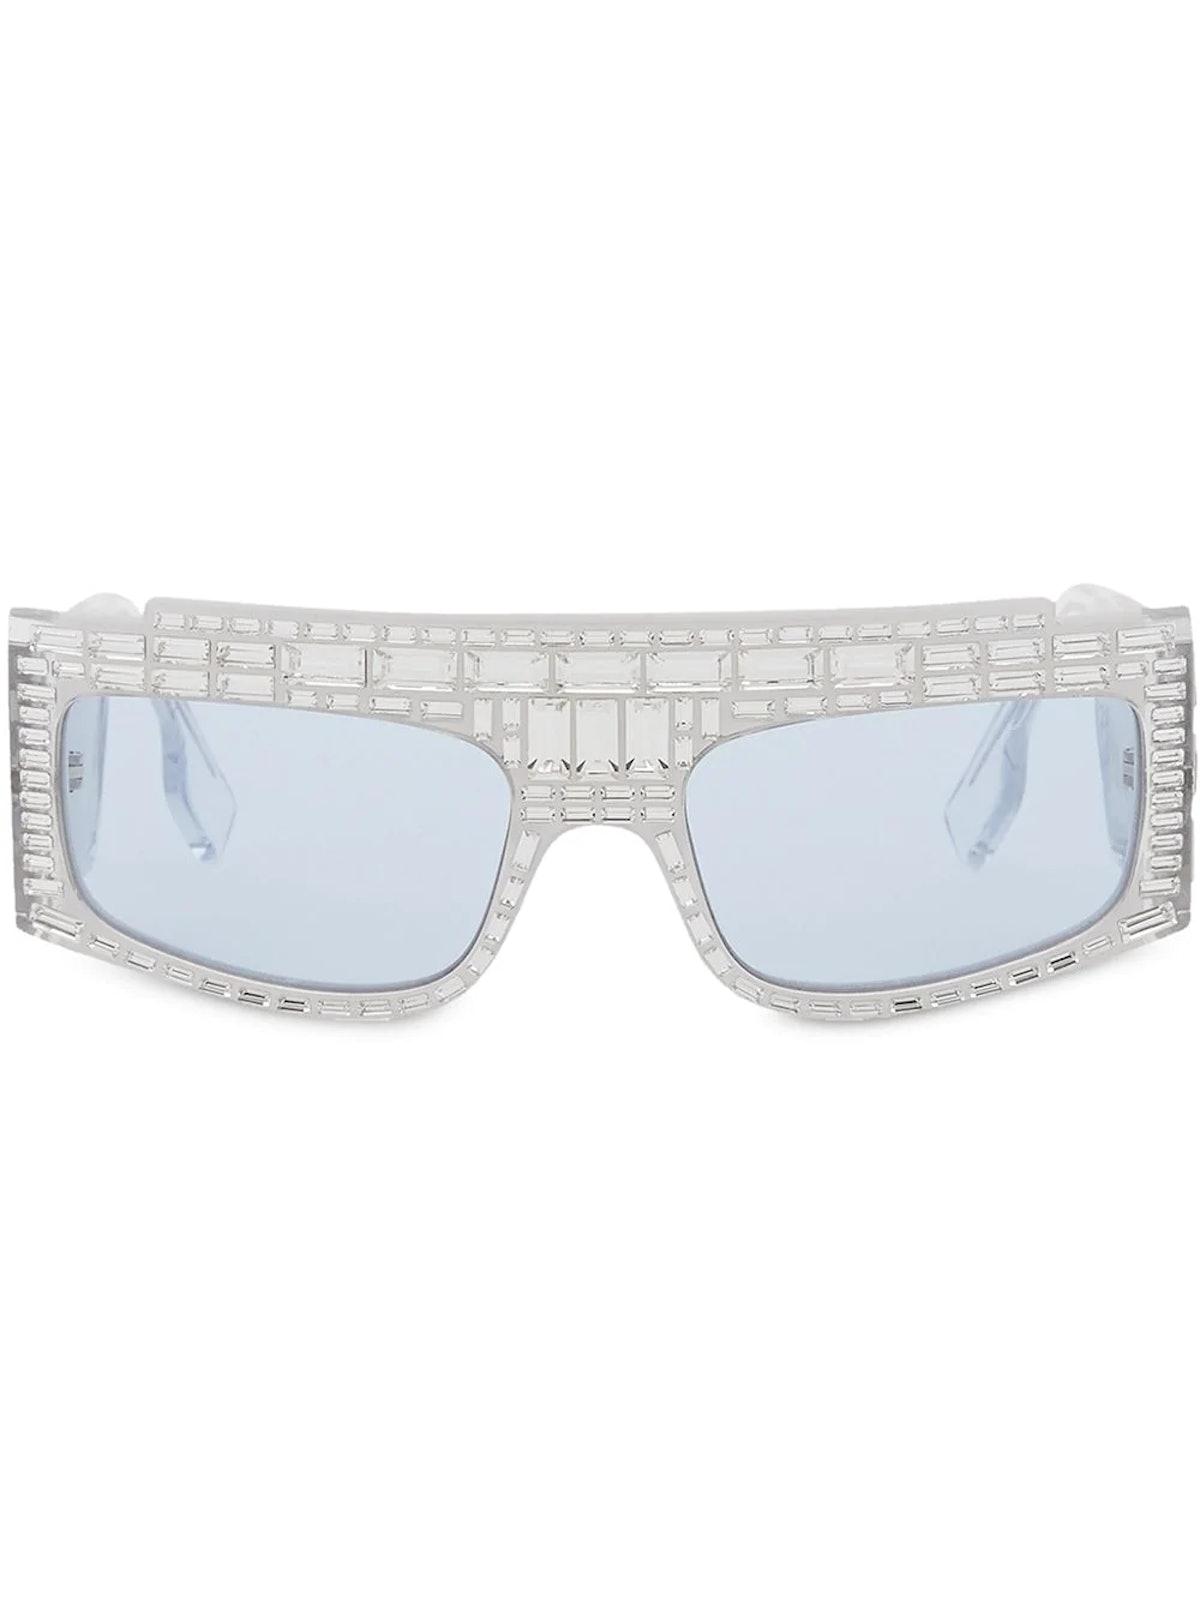 Burberry crystal-embellished rectangular sunglasses